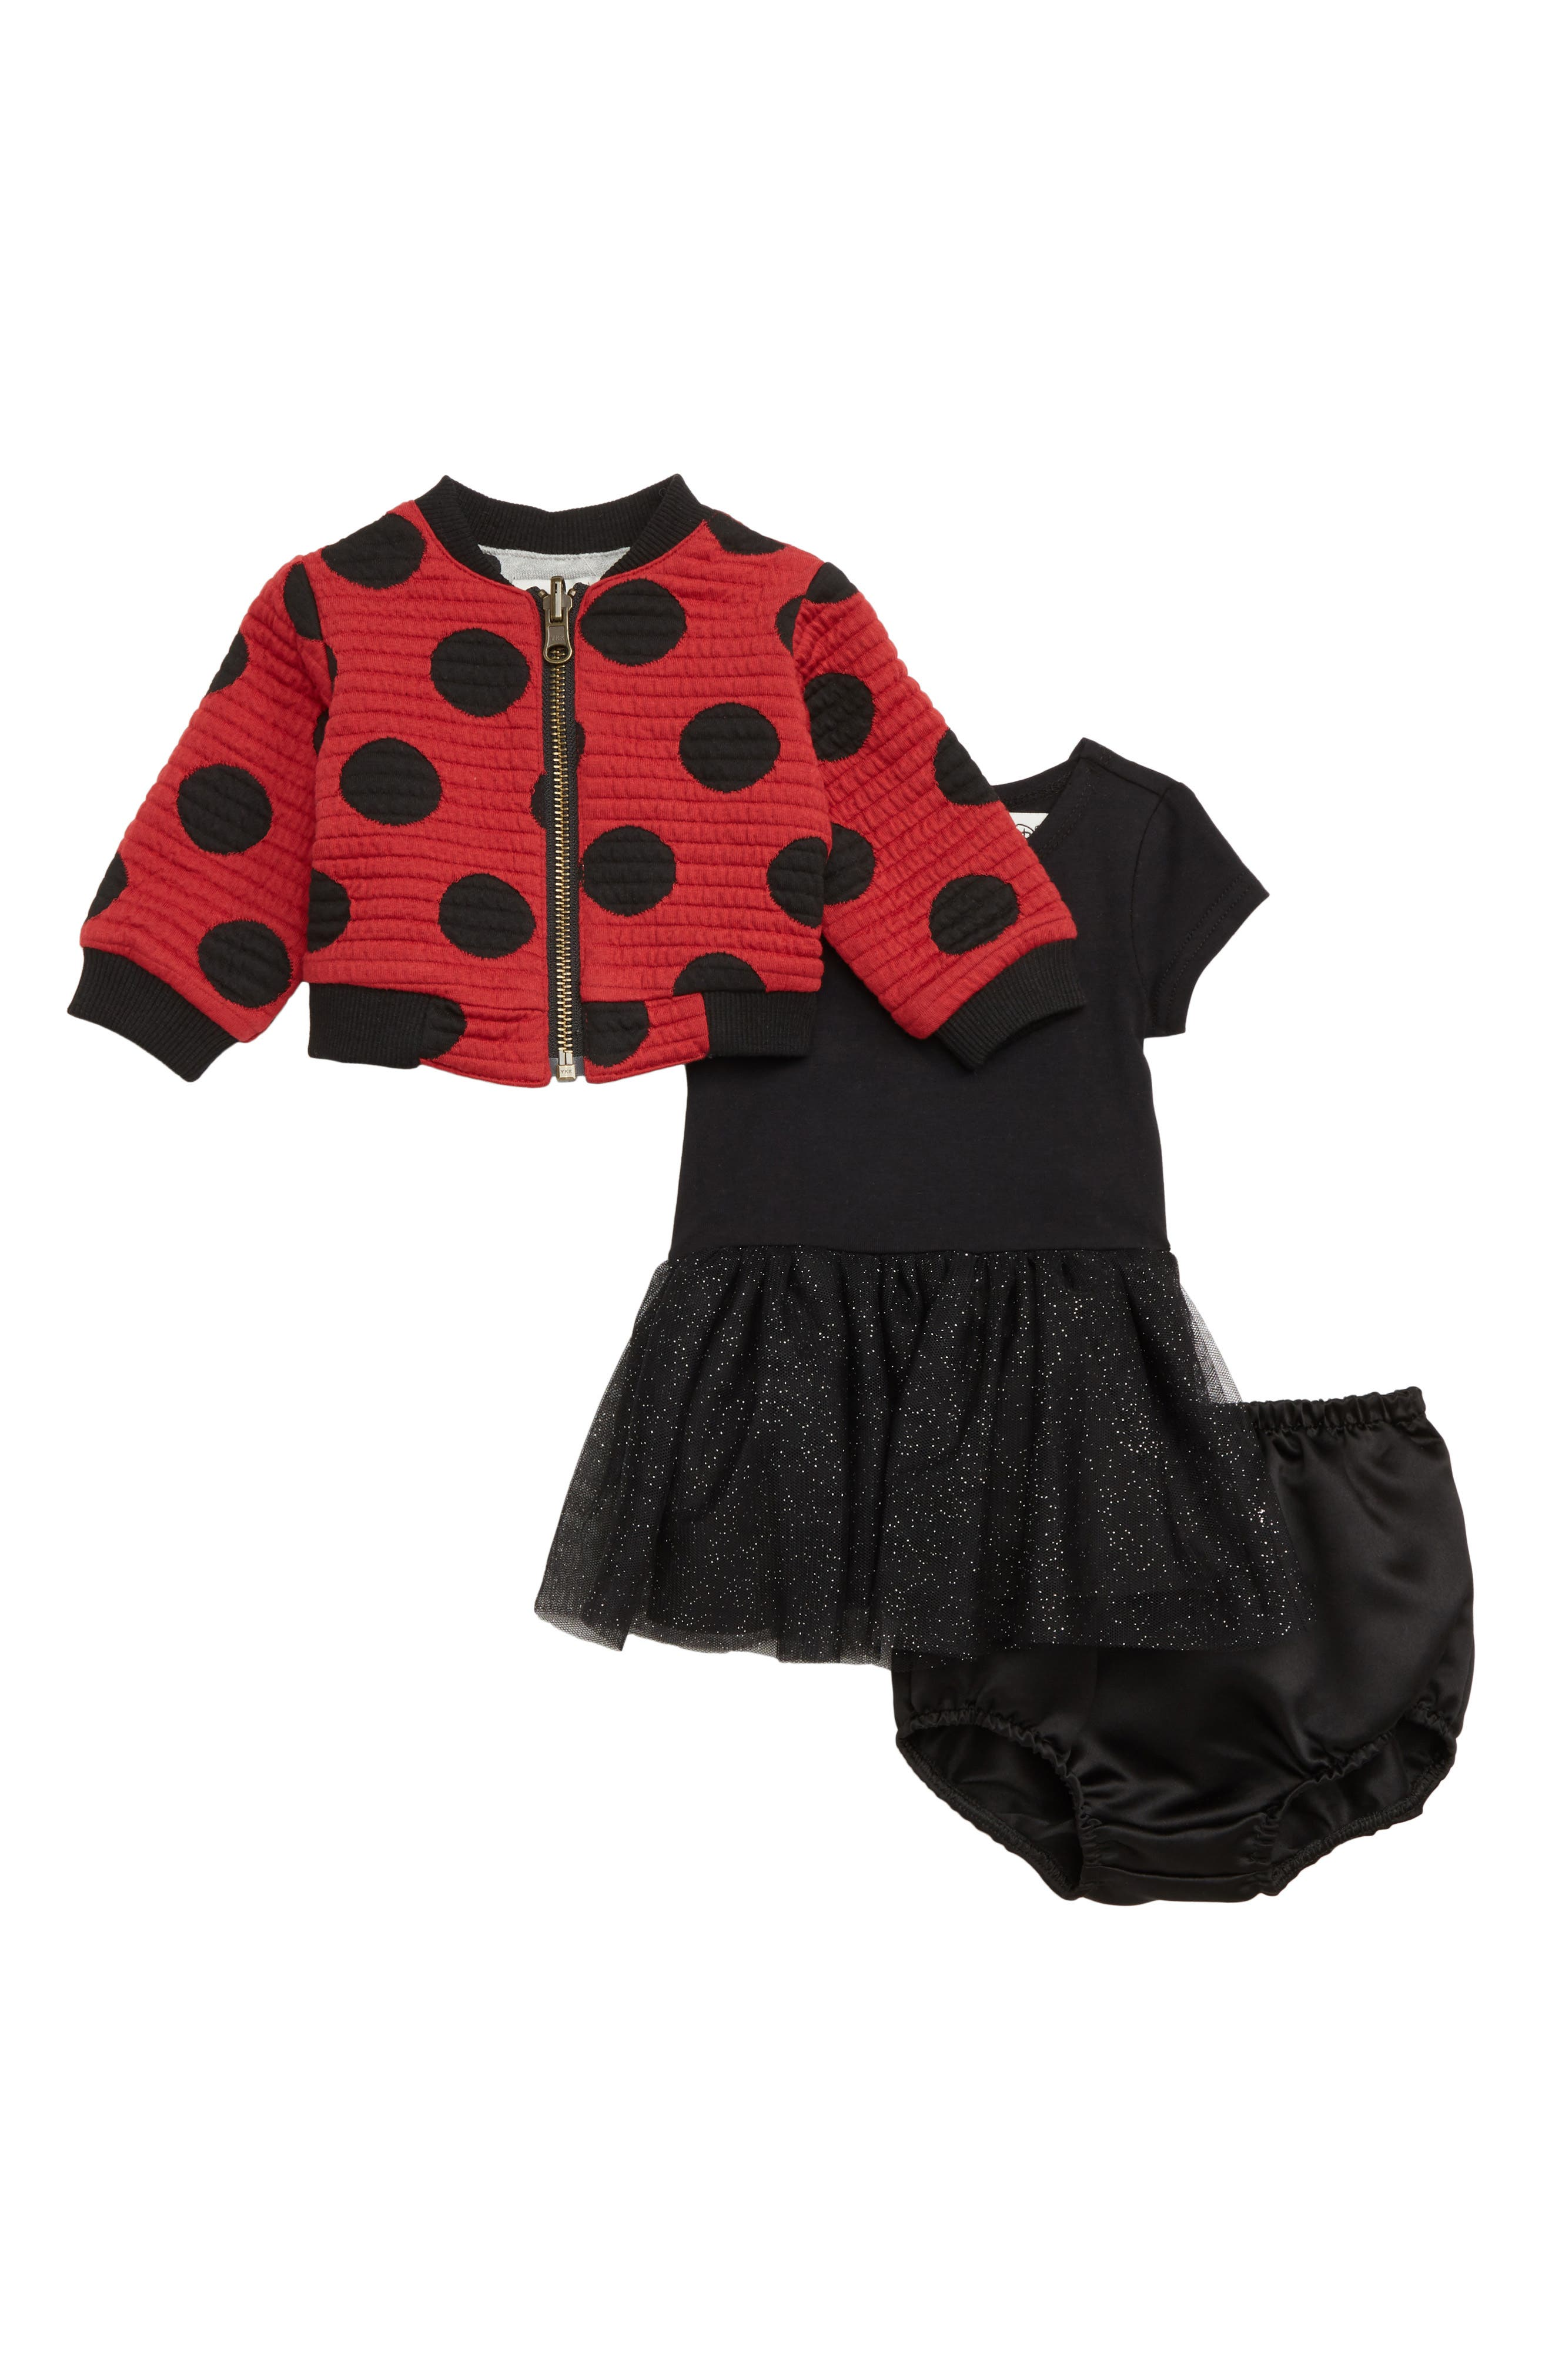 x Disney Minnie Mouse Tutu Dress & Reversible Bomber Jacket Set,                             Main thumbnail 1, color,                             619